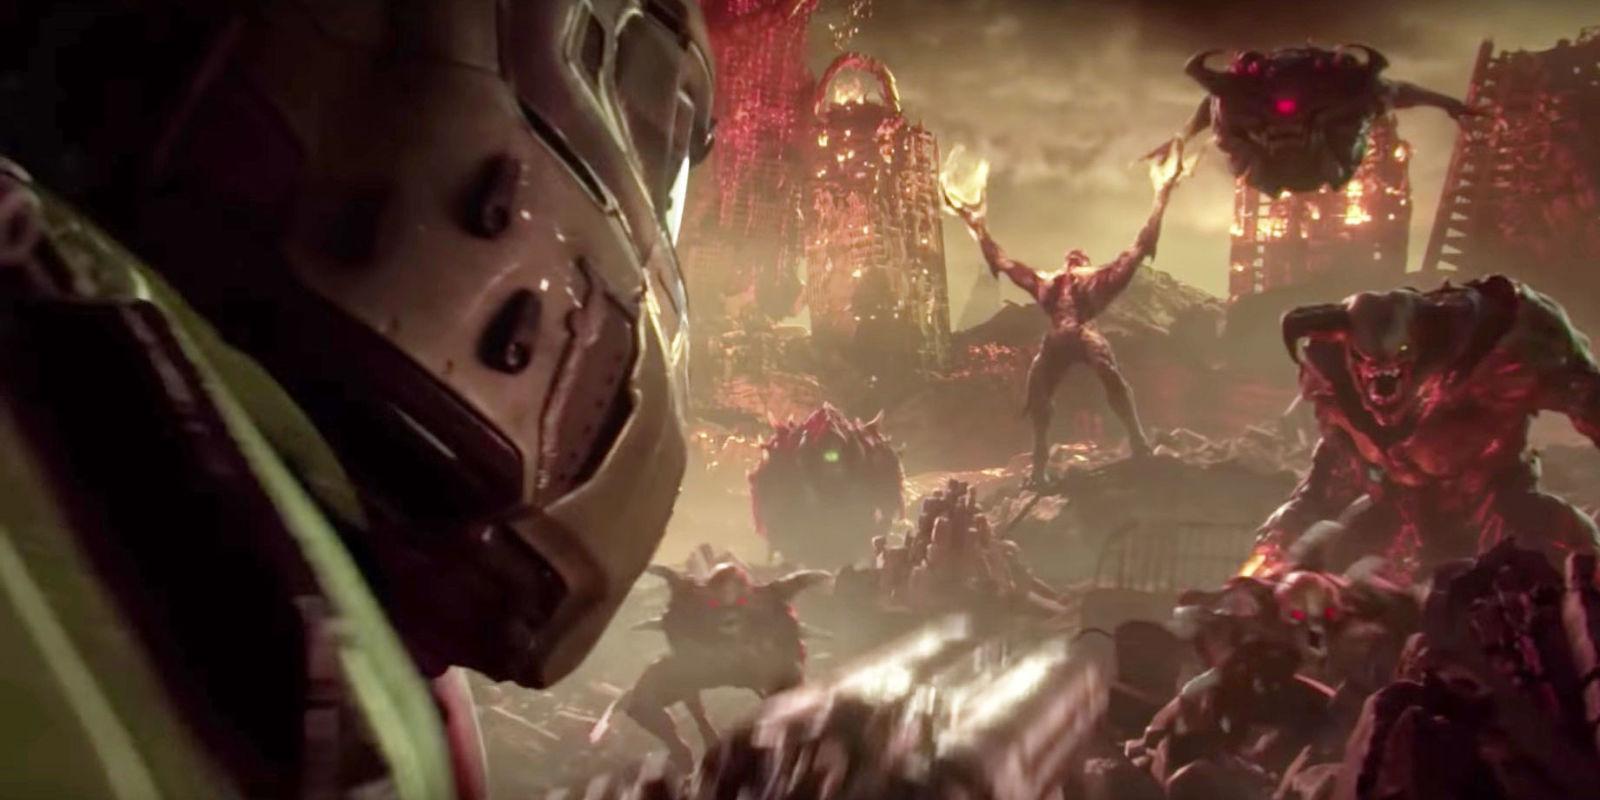 Wwe Logo Hd Wallpaper Doom 2 Aka Doom Eternal Revealed At E3 2018 And It S Going